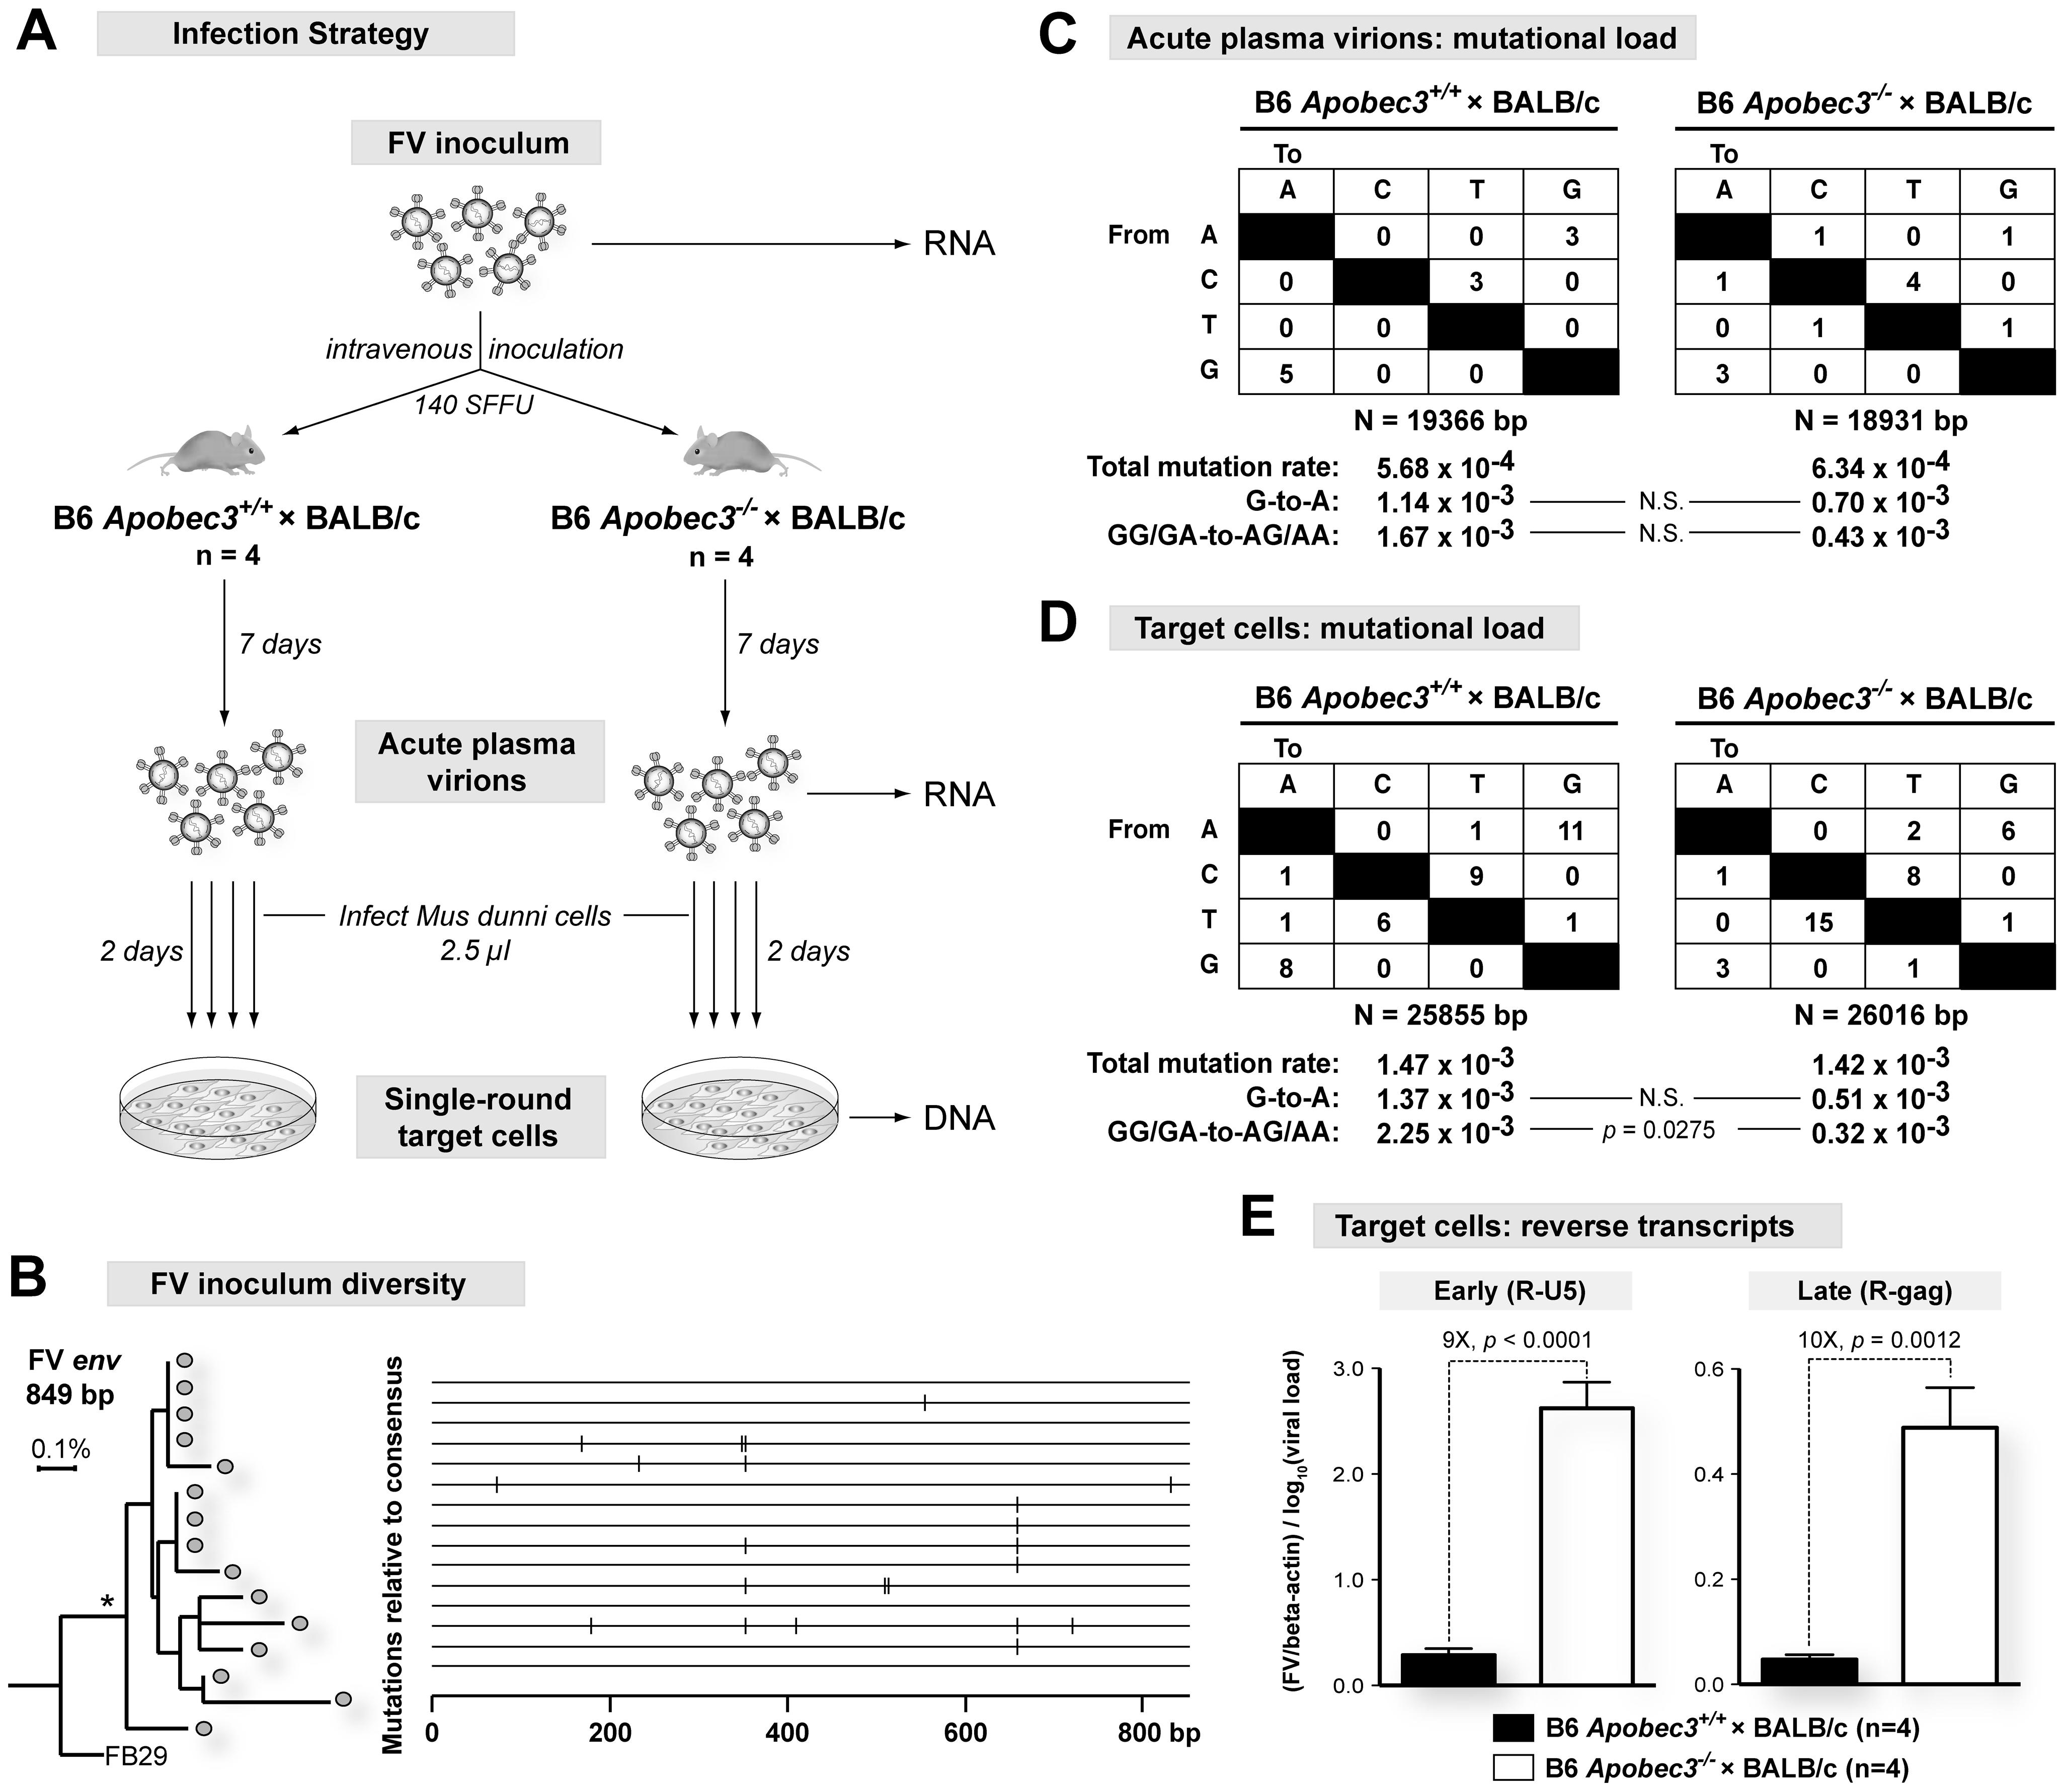 Mechanism of B6 <i>mA3</i> inhibition of plasma virion infectivity.